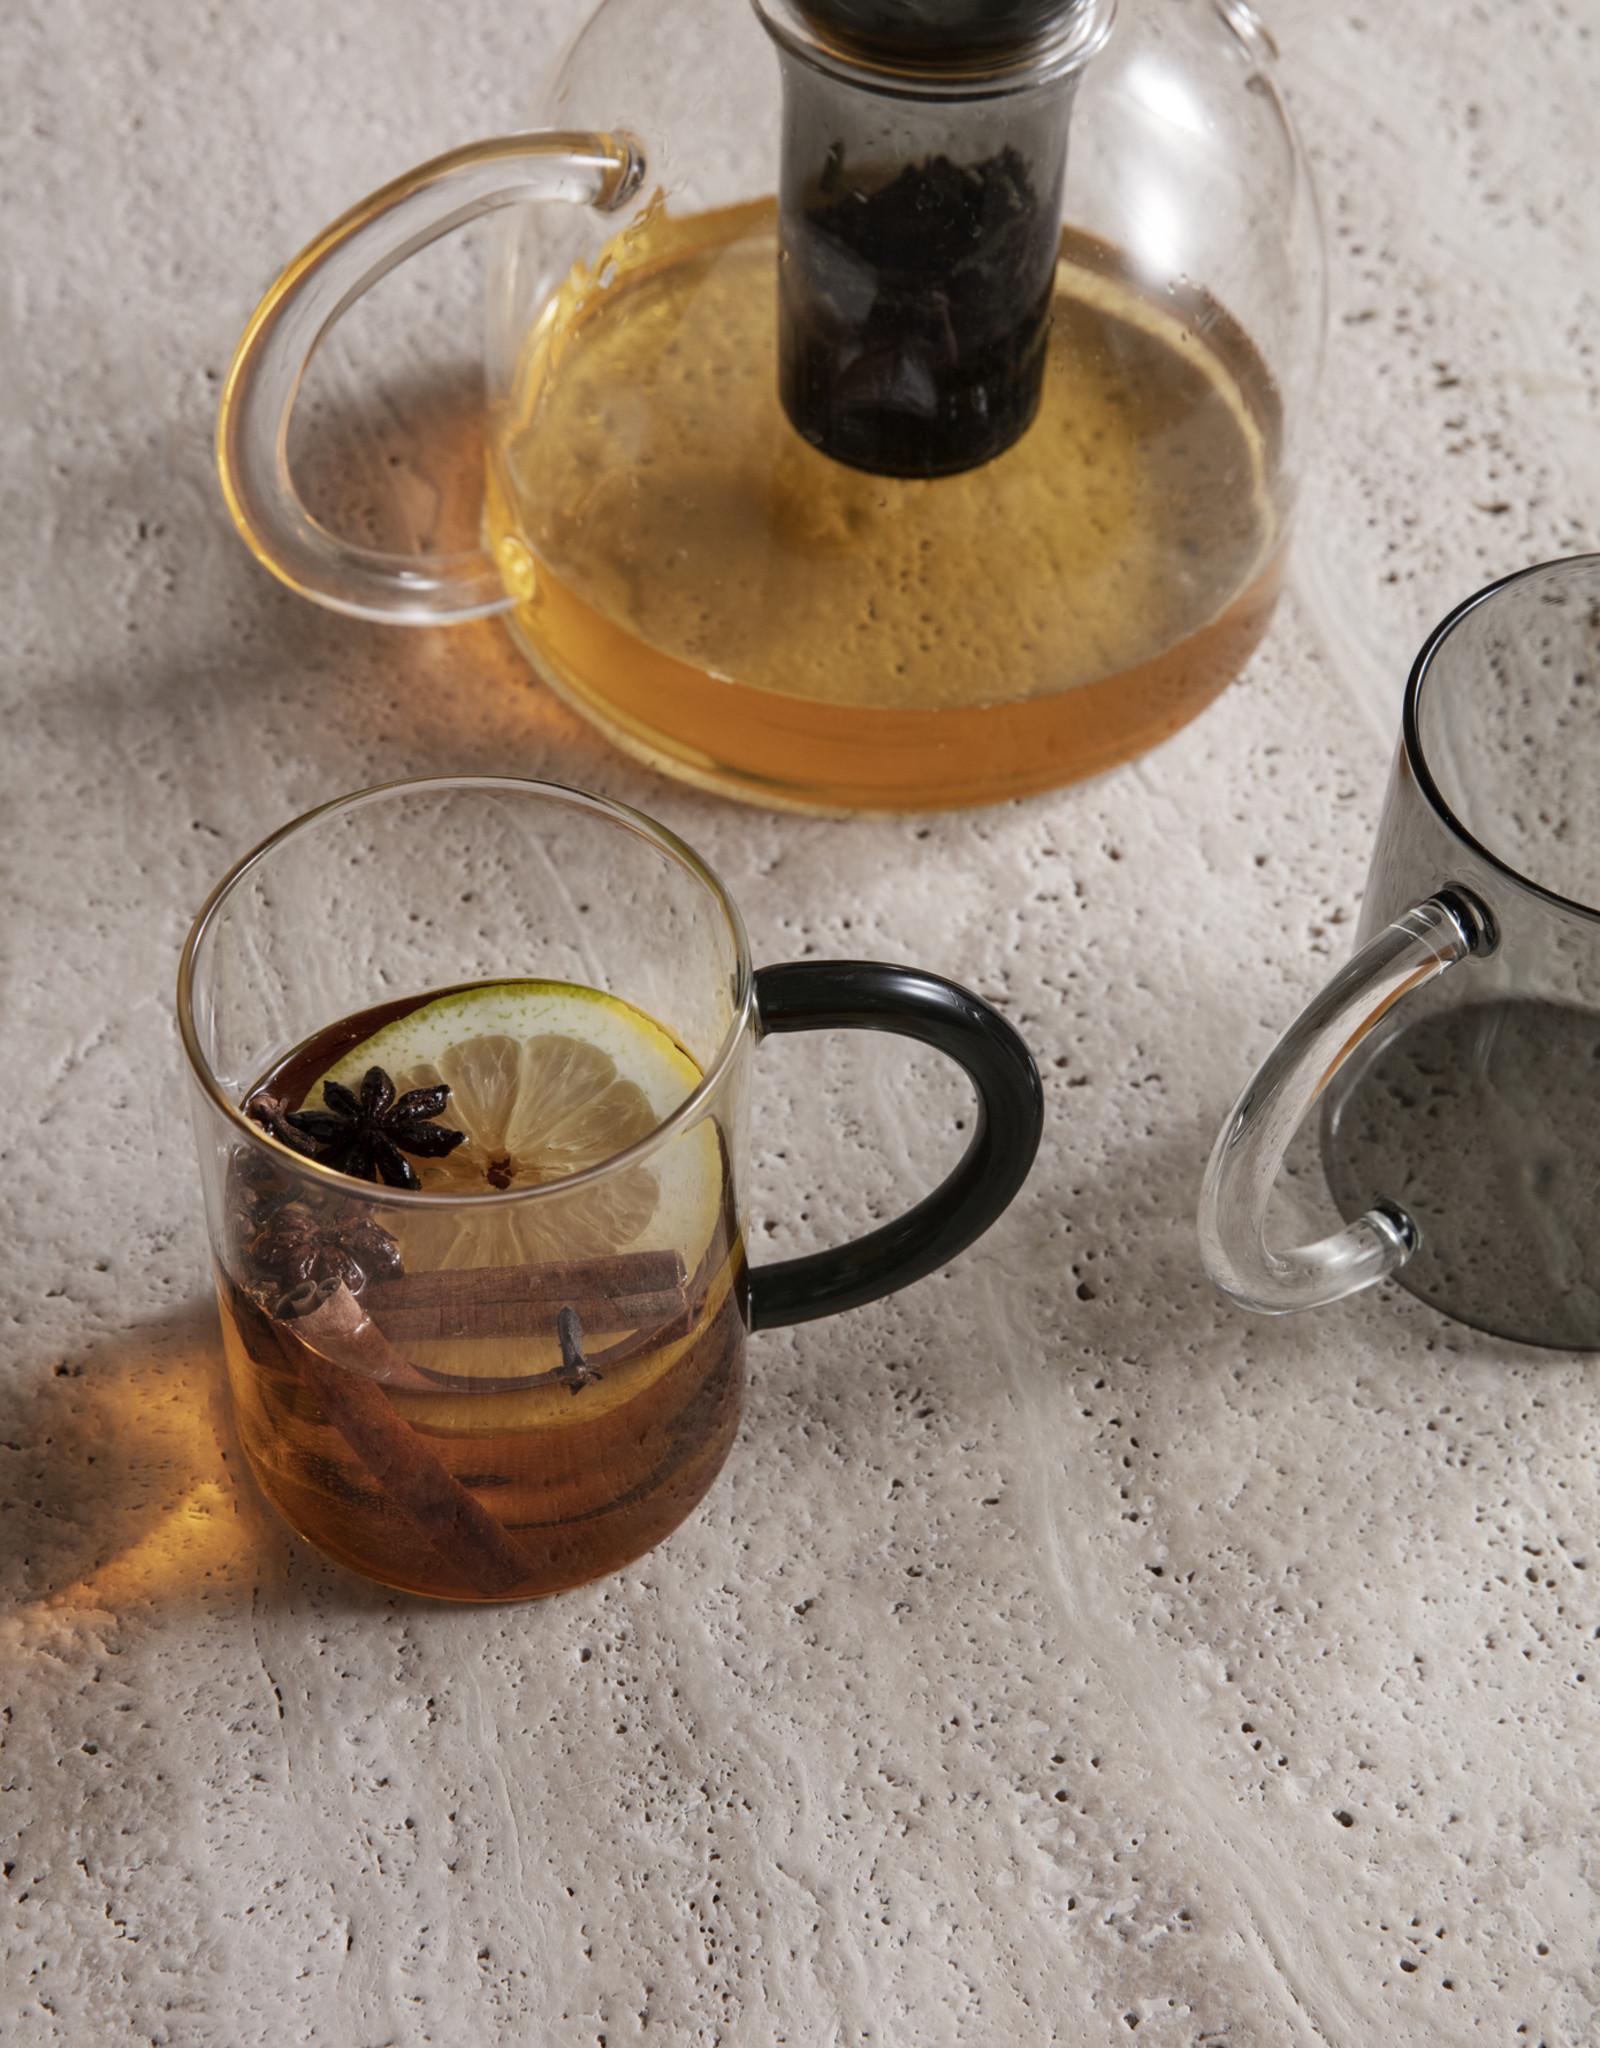 Ferm LIVING ferm LIVING Still Mug set of 2 - clear